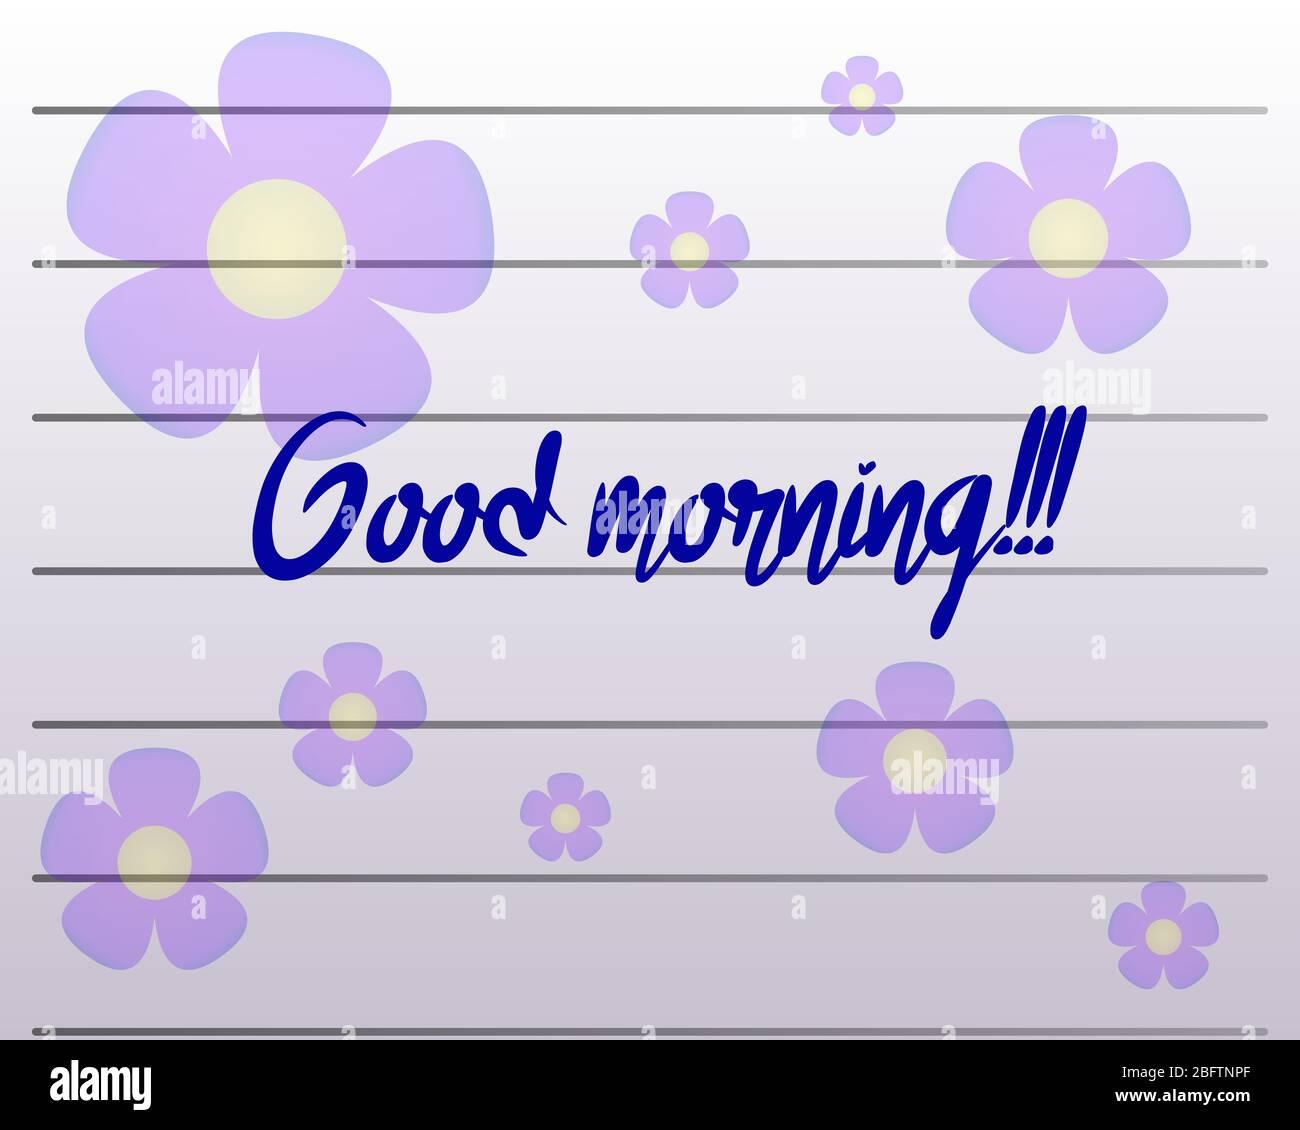 Good morning like